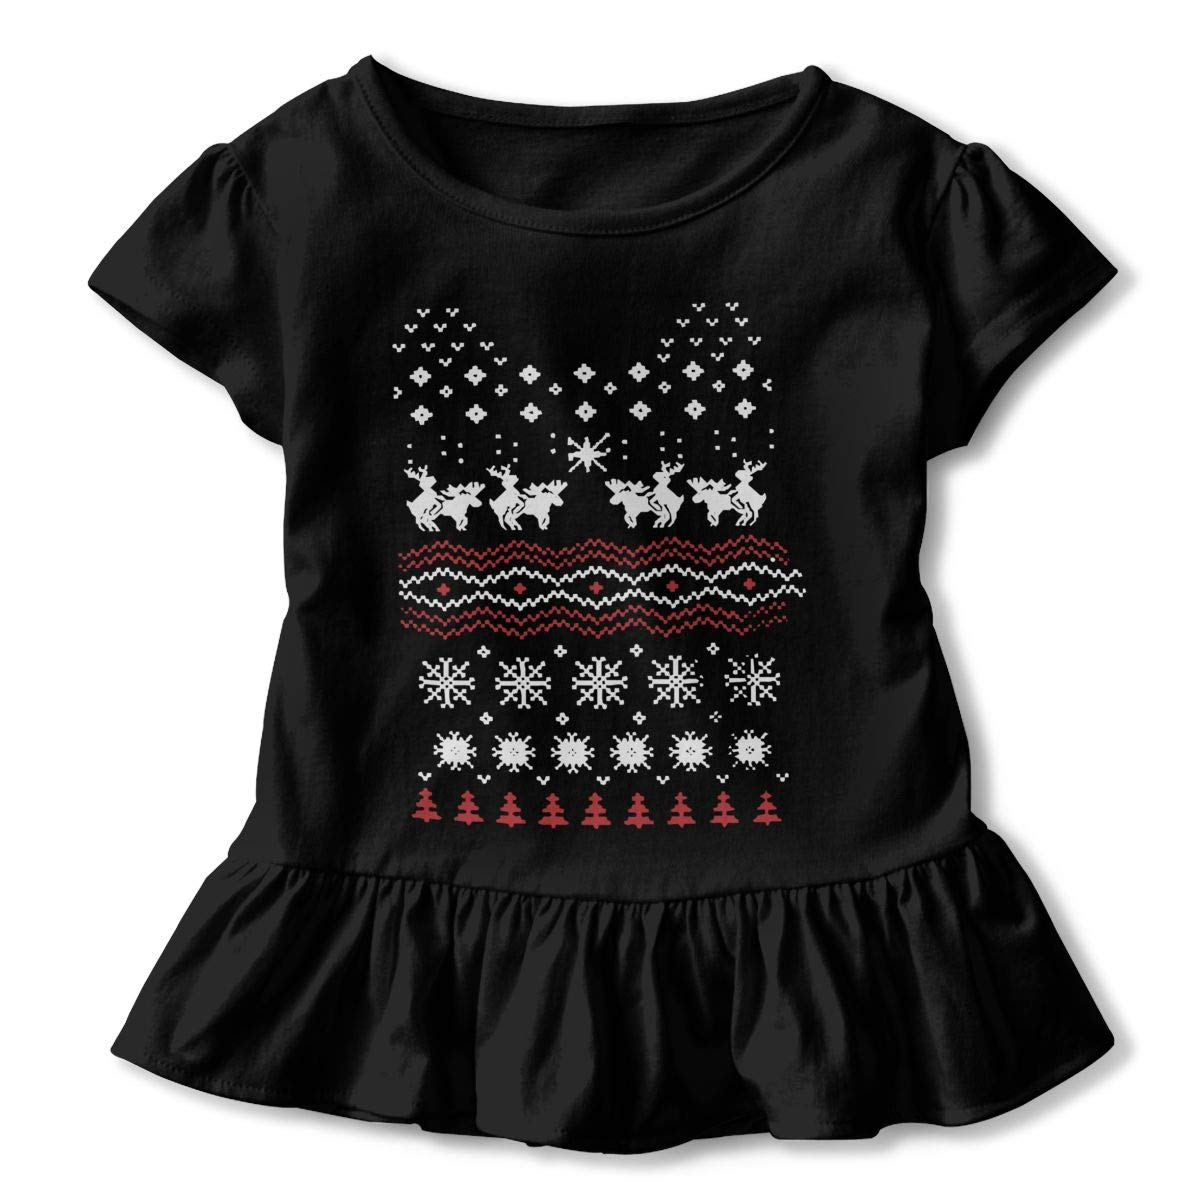 2-6T Zi7J9q-0 Short-Sleeve Humping Moose Holiday Shirts for Kids Fashion Sweatshirt with Falbala